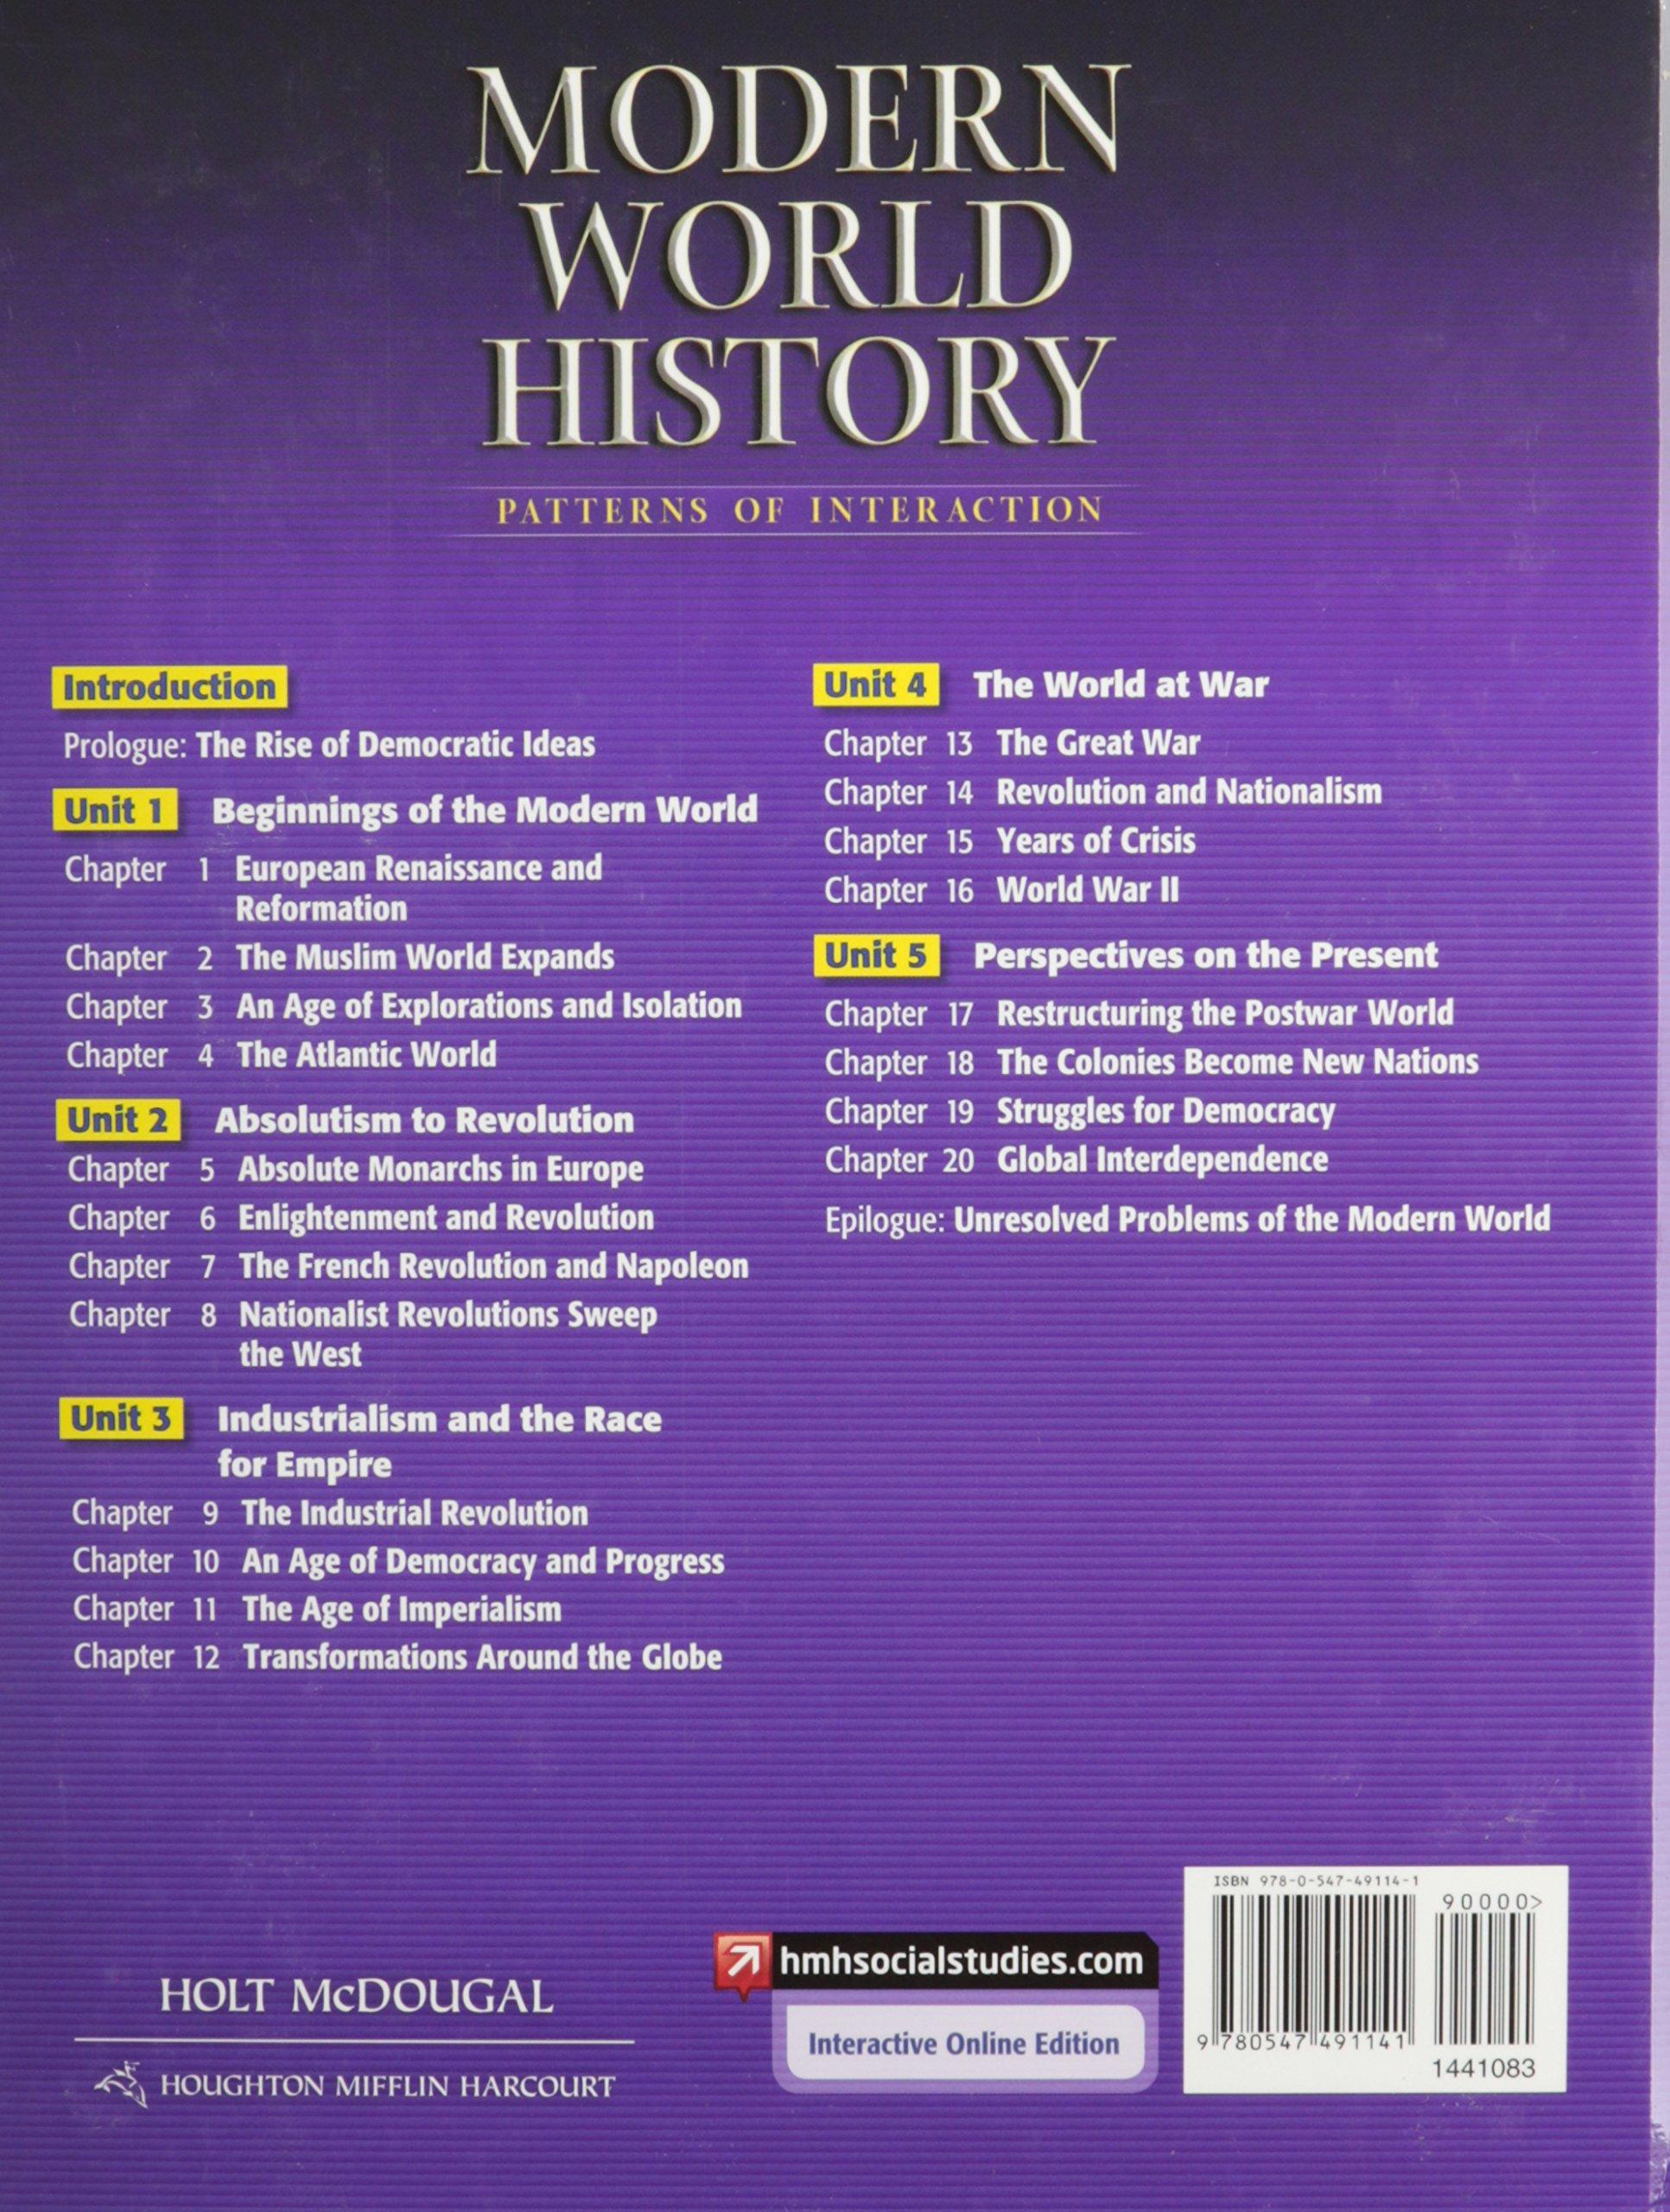 Modern World History Textbook Holt Mcdougal